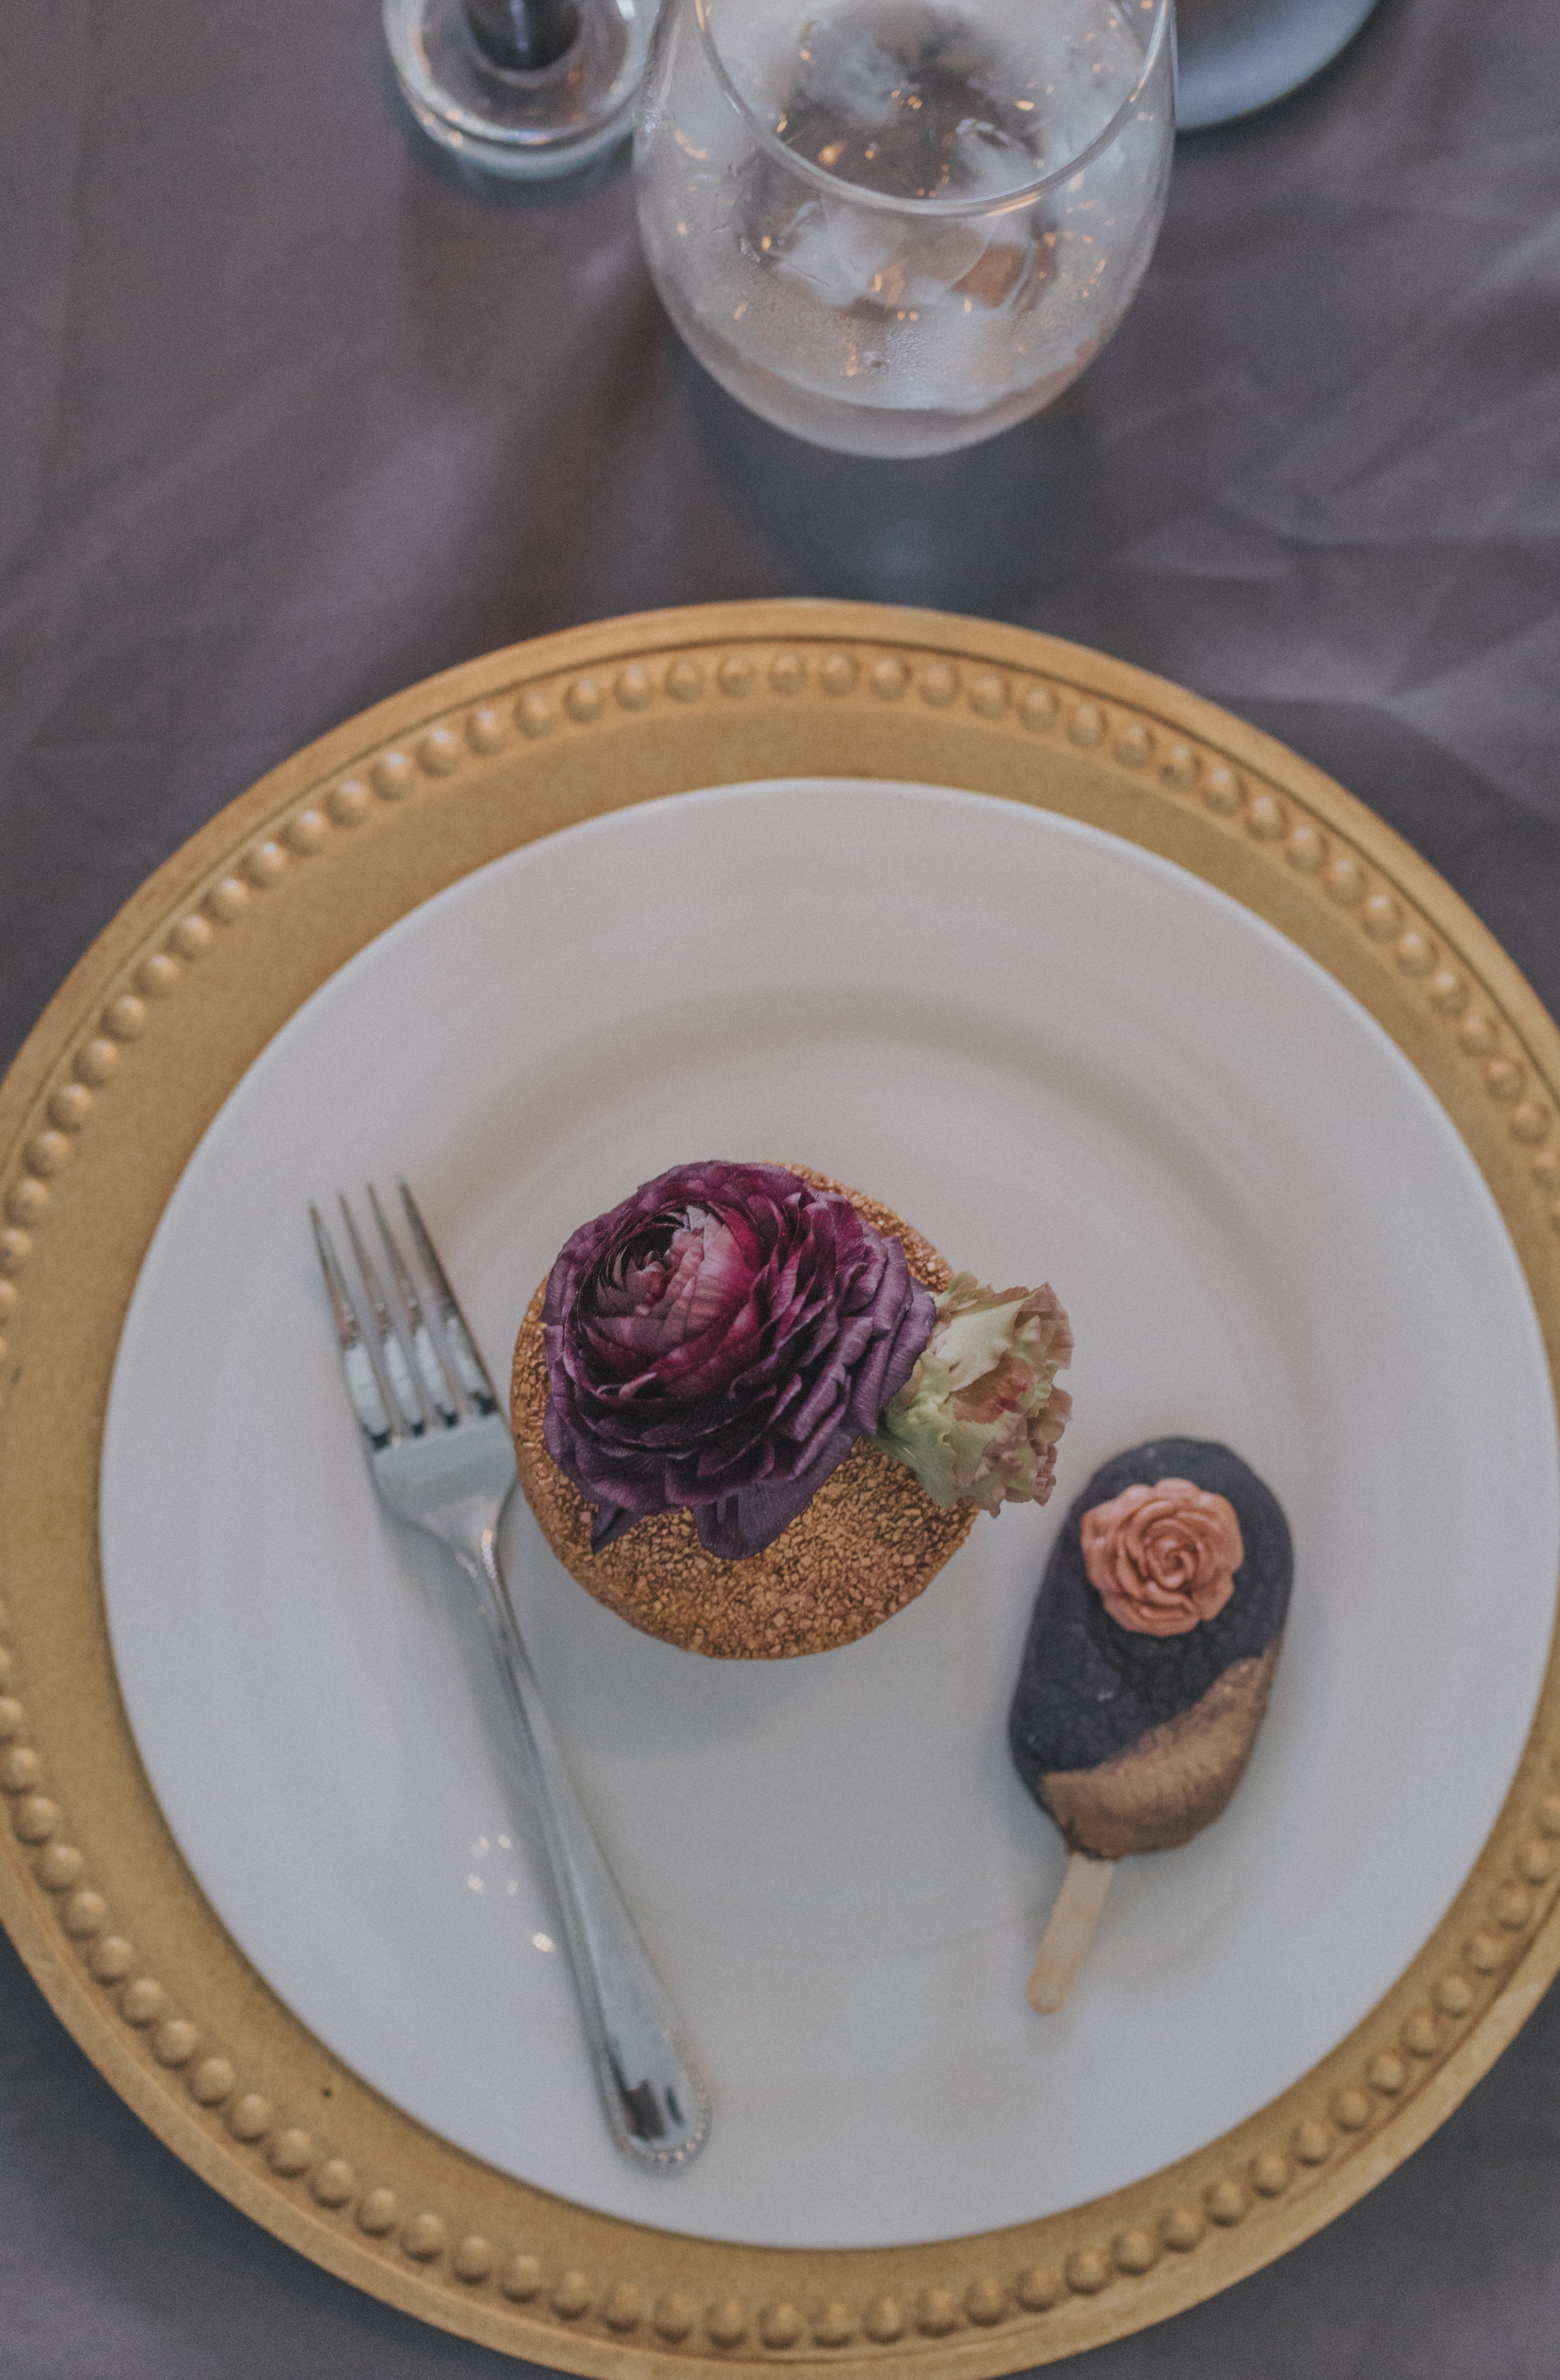 214  omaha-nebraska-empire-room-tiny-luxe-wedding-planner.jpg